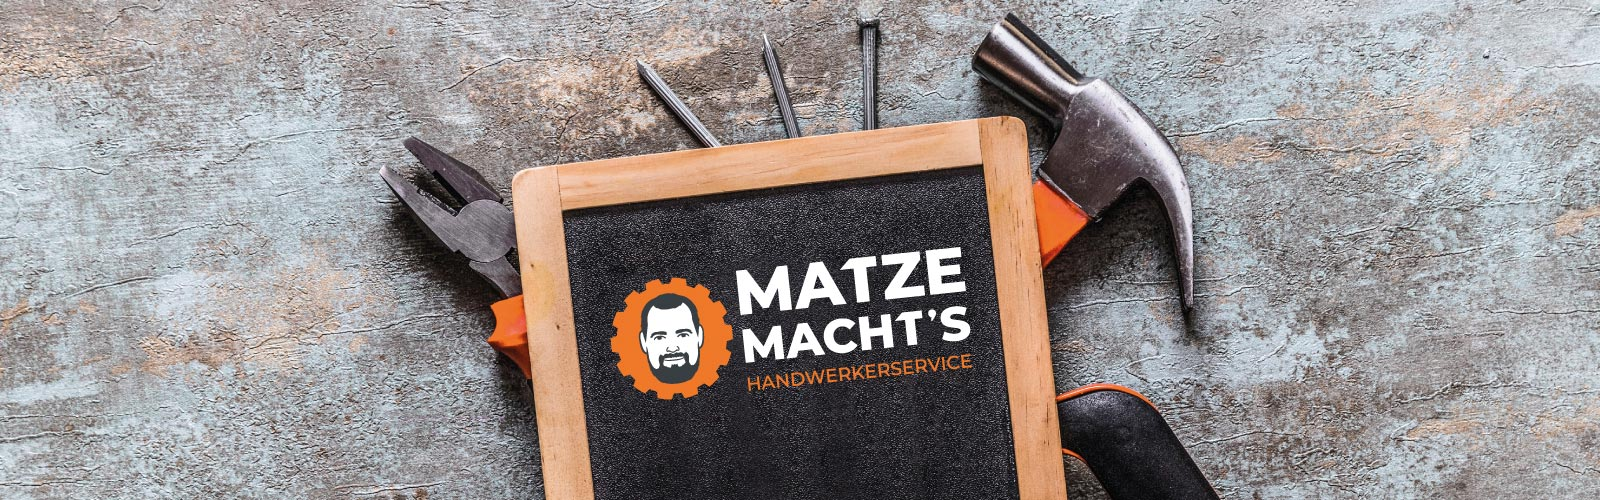 Matze macht's - Profil